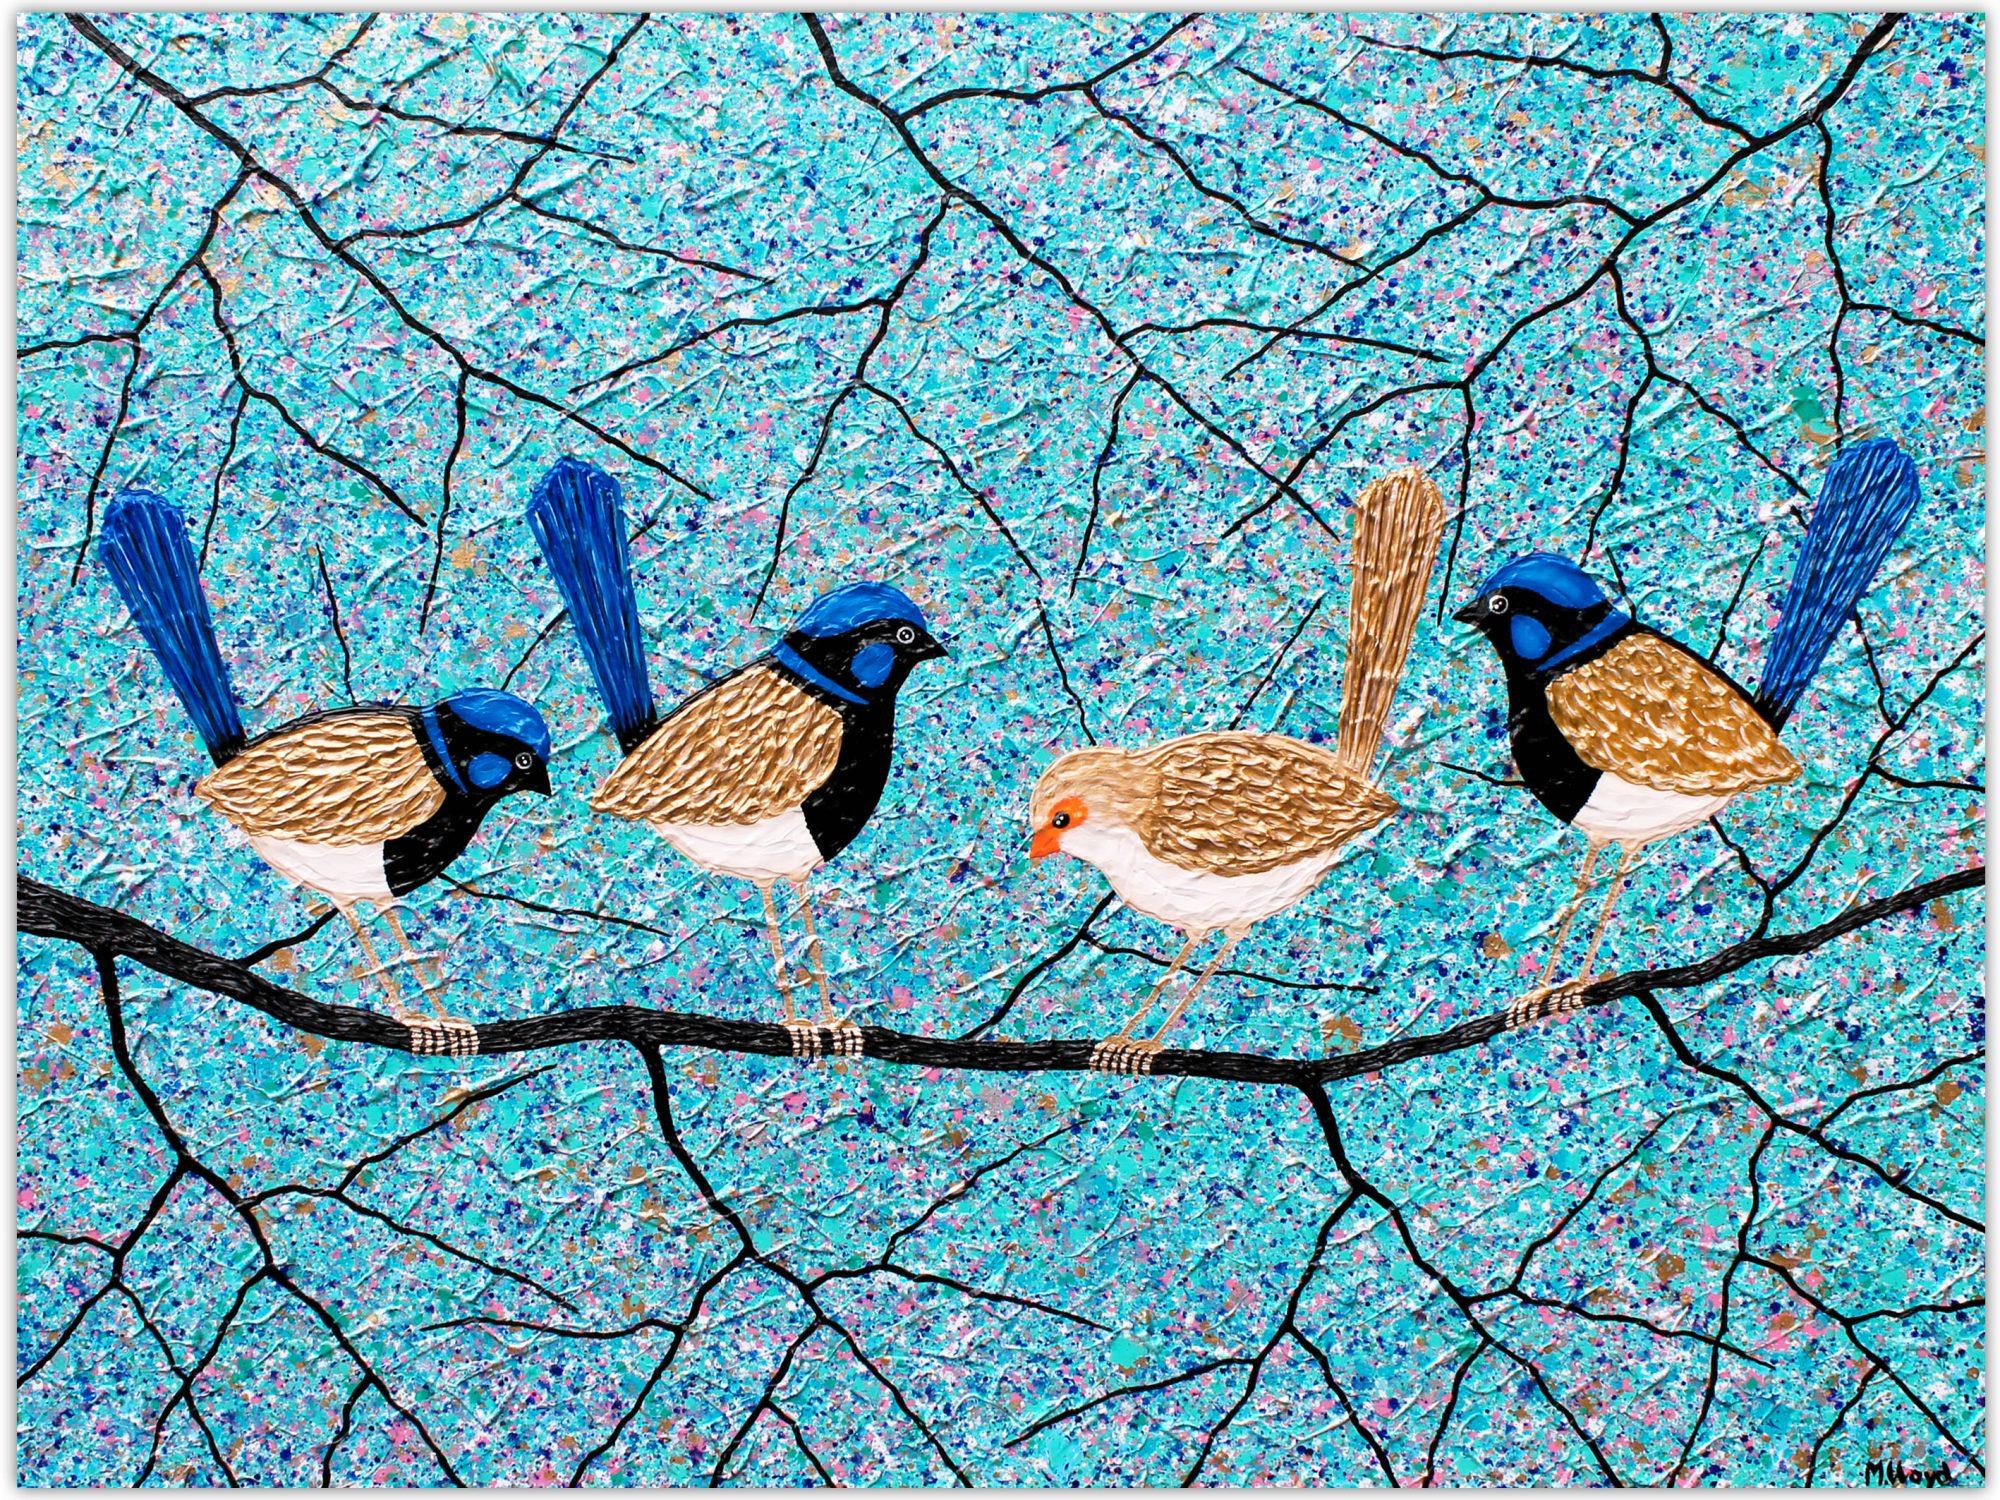 Blue Wrens Fairy Wrens Miranda Lloyd Artist Australia